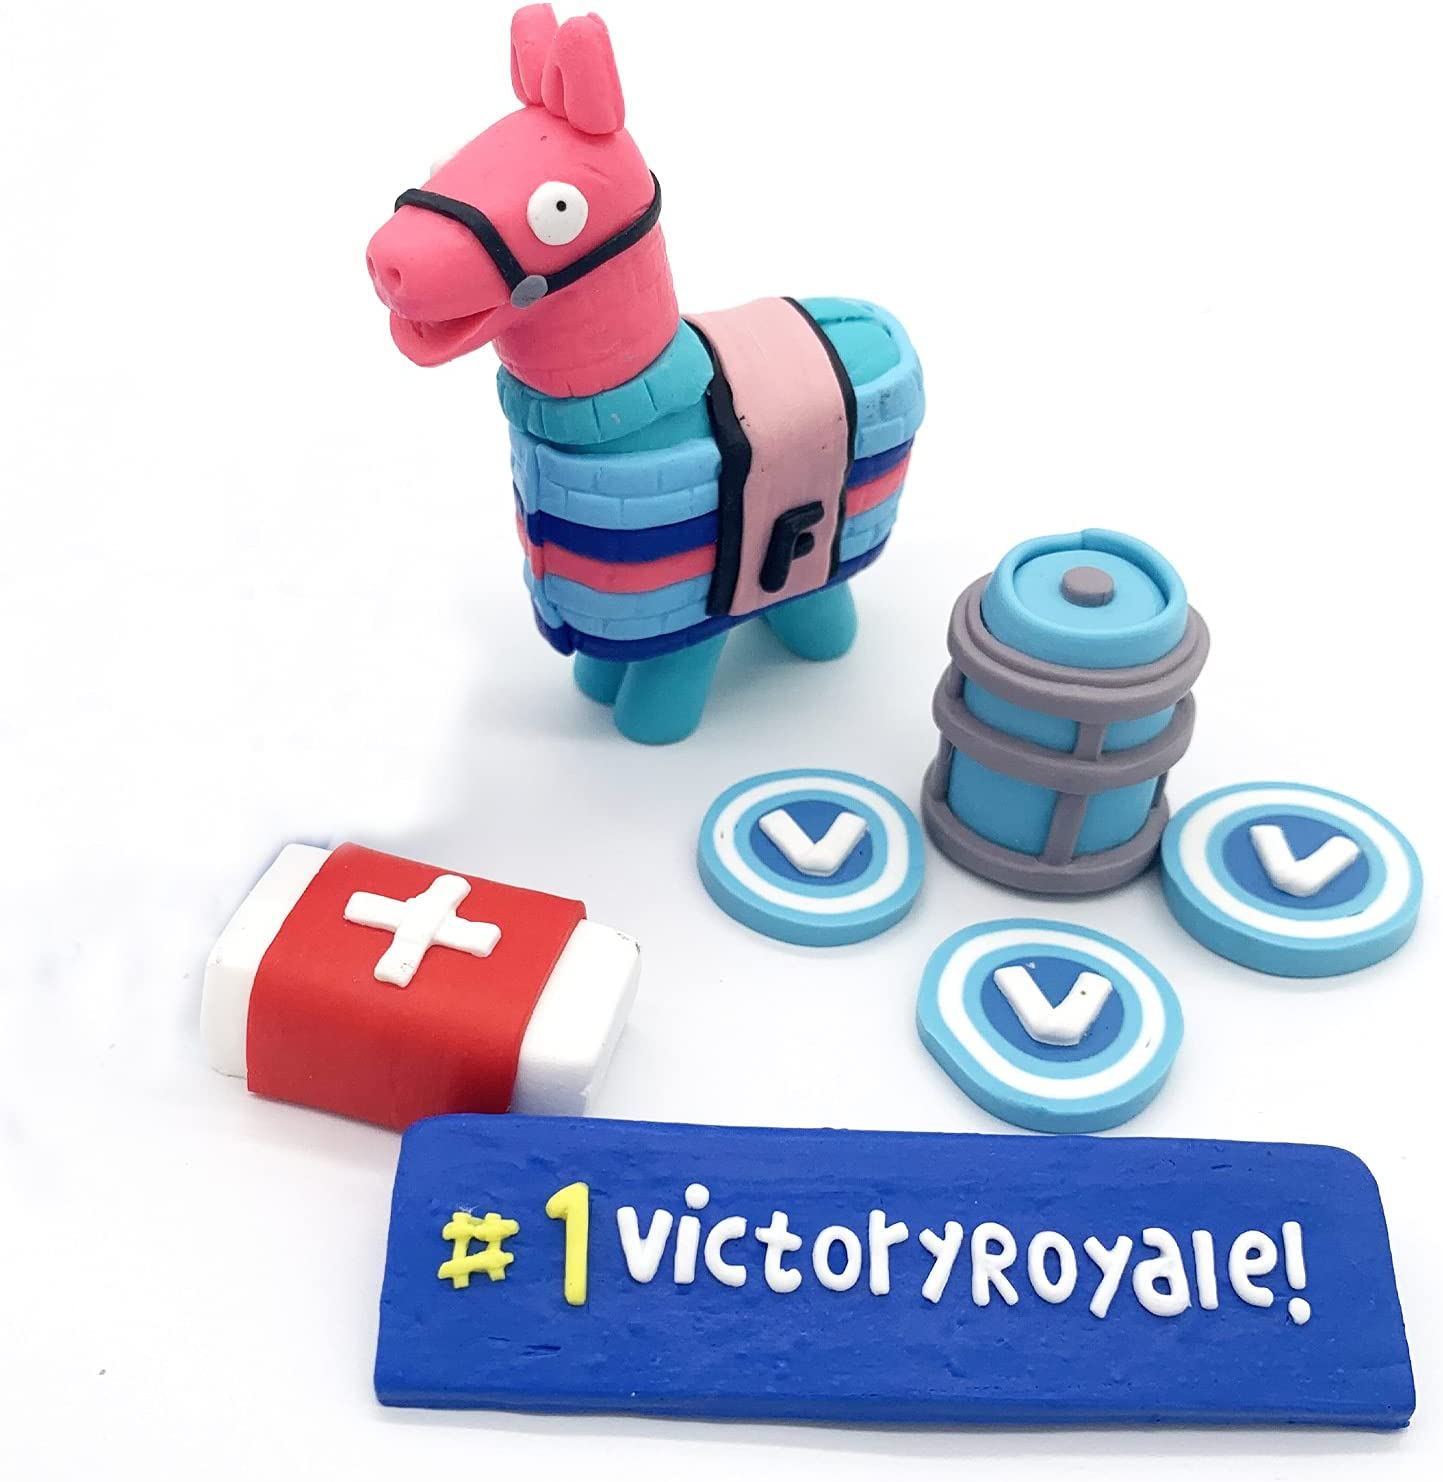 7Pcs Direct store Handmade Battle Royale Video Game Topper Llama High material Cake De